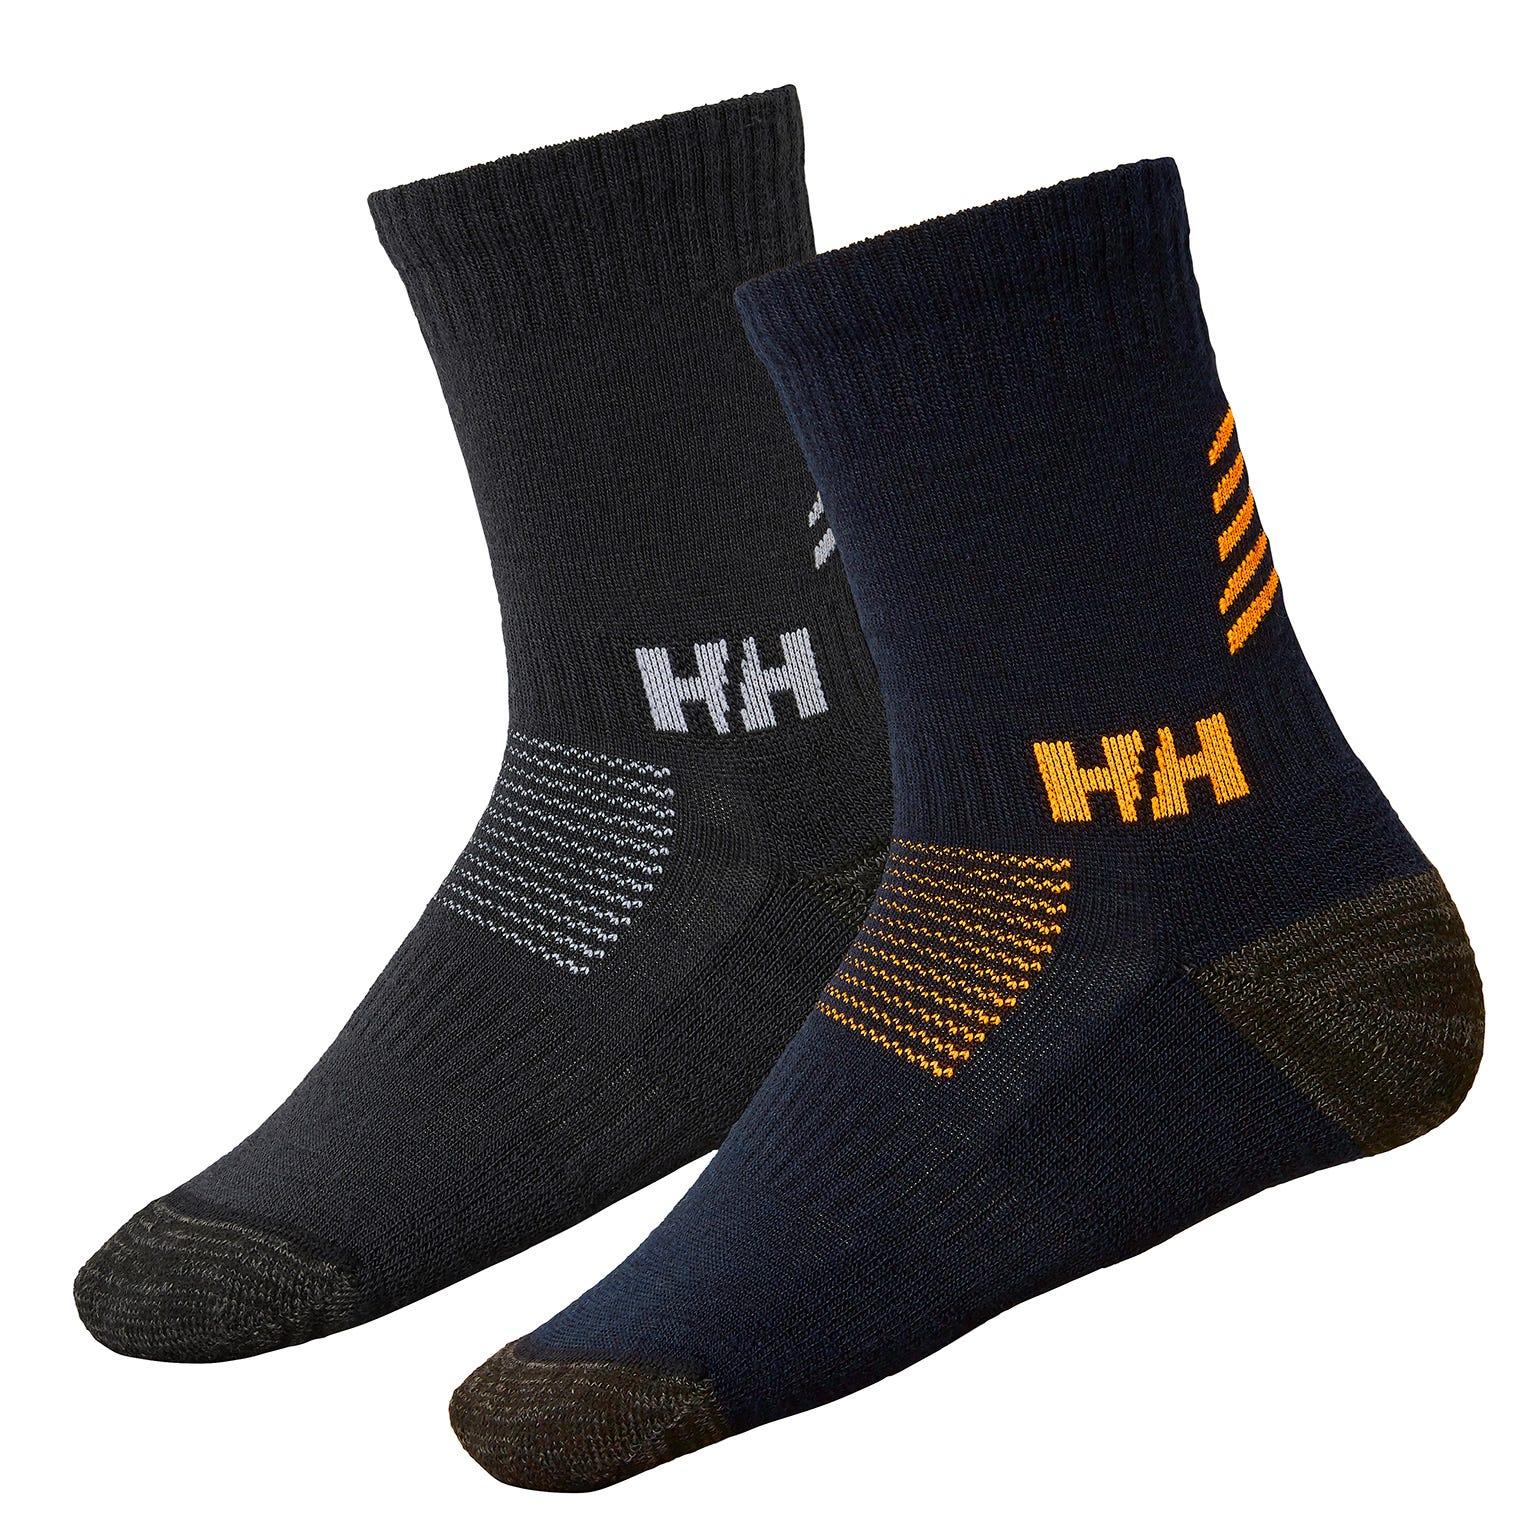 Helly Hansen Junior Lifa Merino 2pack Socks Kids Baselayer Navy 31-34